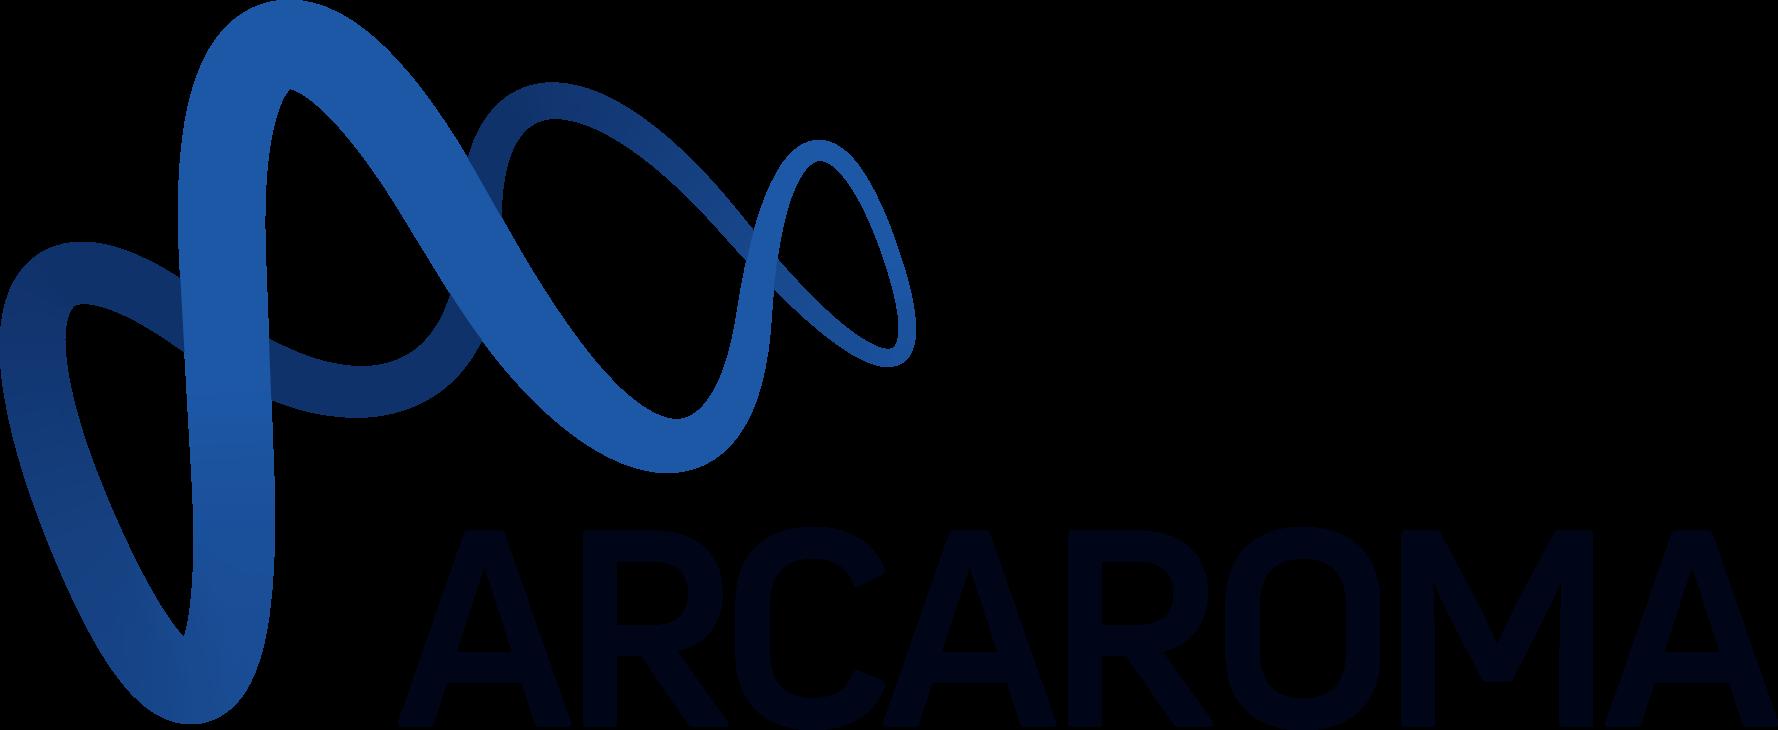 Arcaroma_logotype_Pantone2935